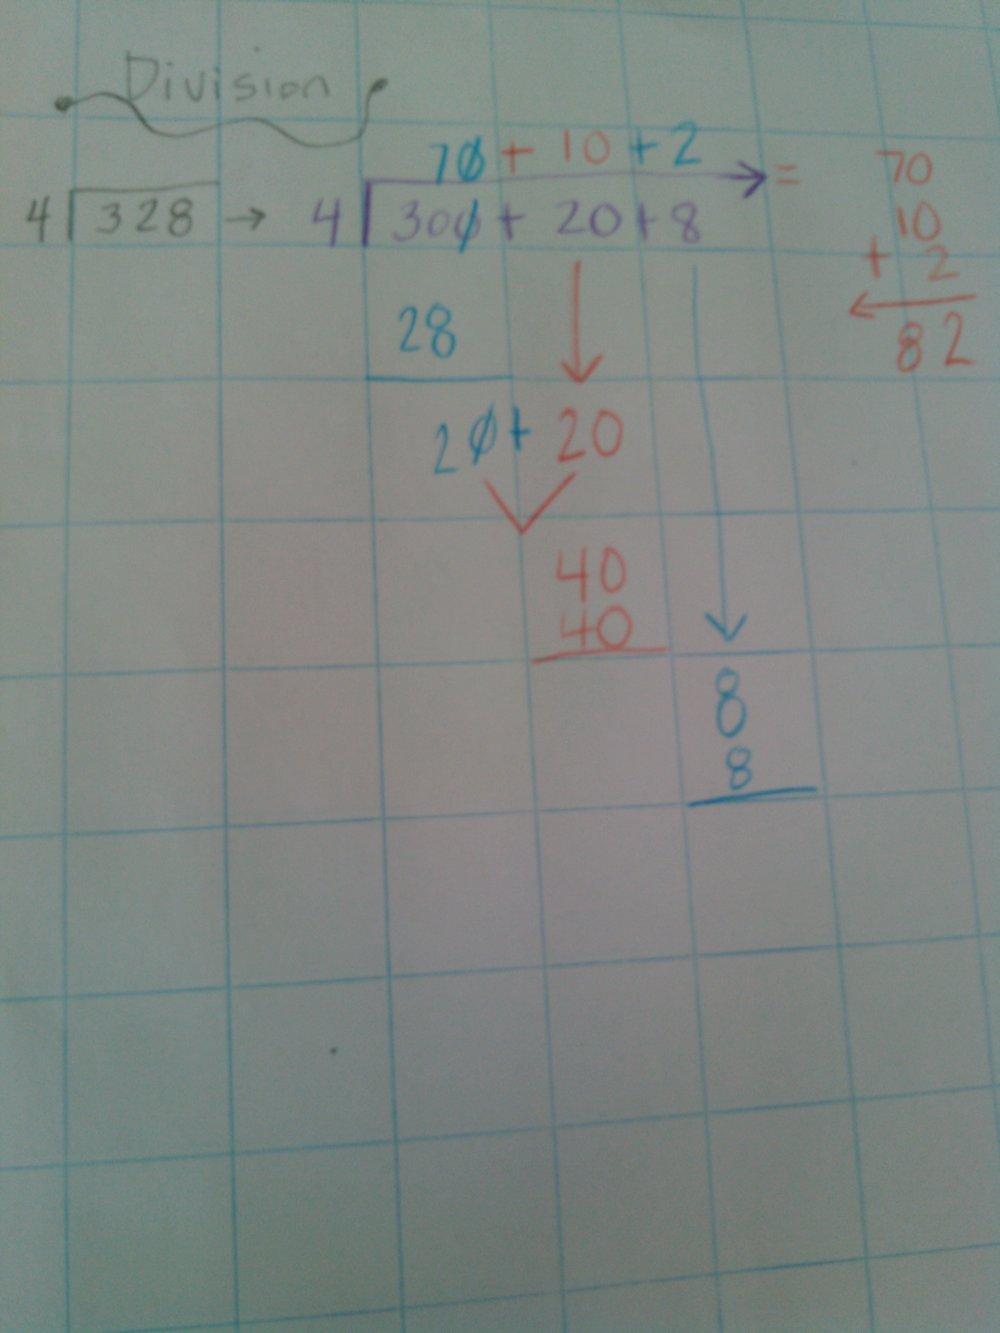 e7aab2e0-bd69-4892-a3e5-de2fab8ca665.jpeg